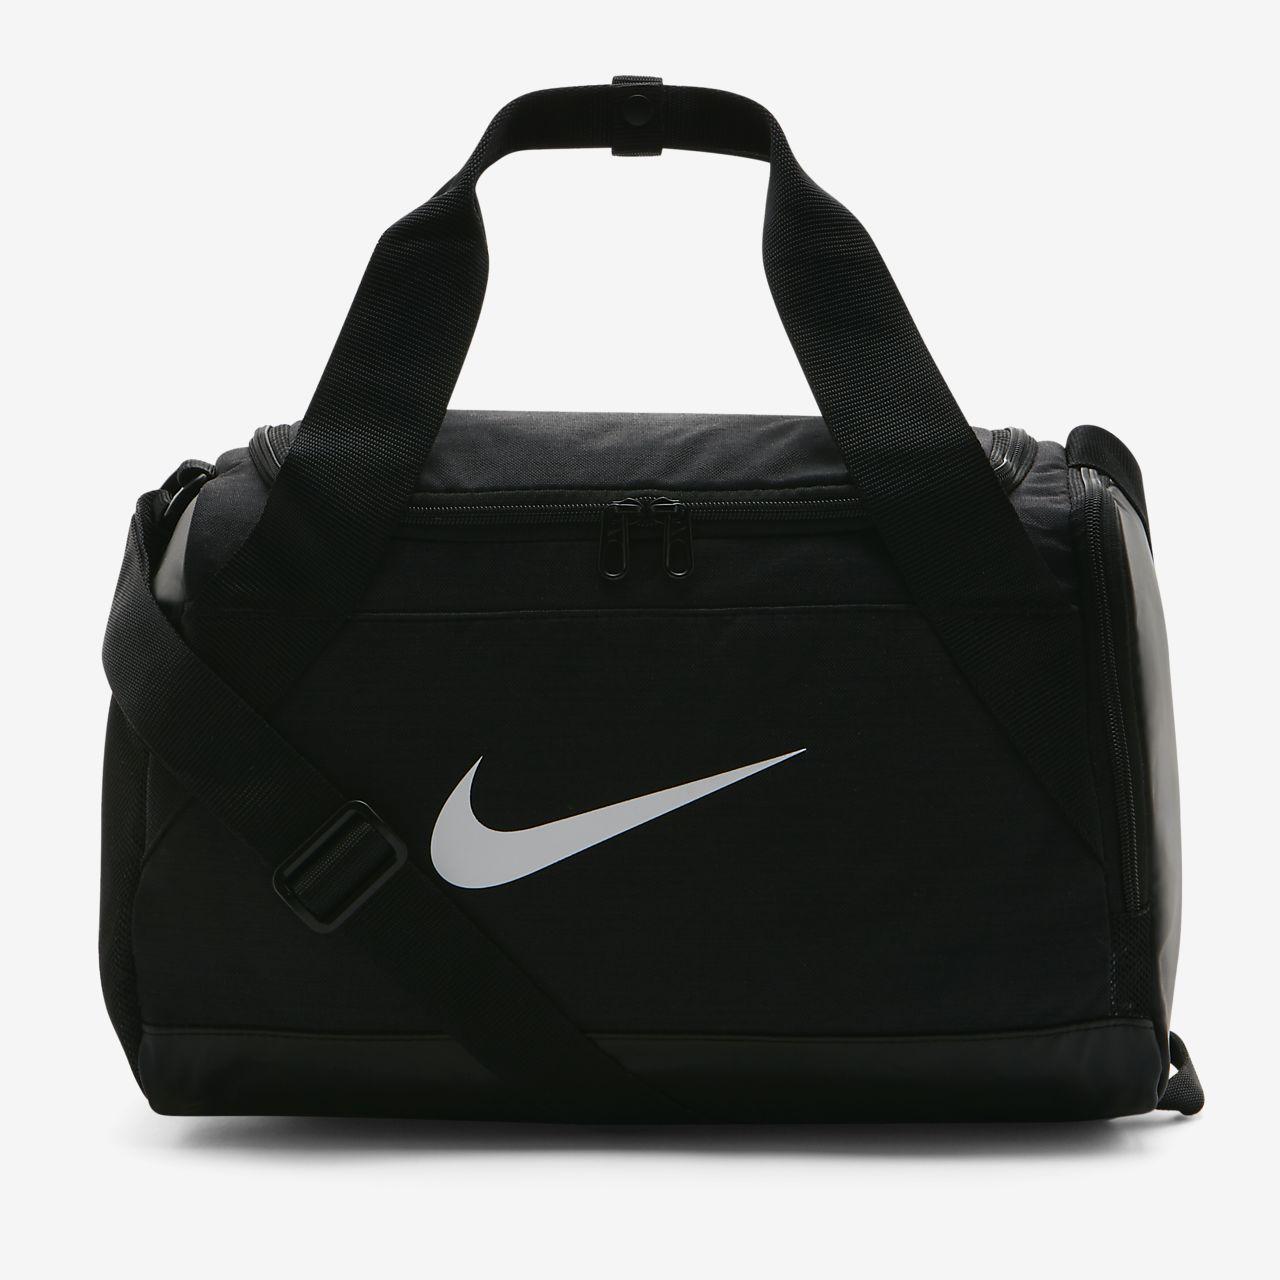 Sac Training TailleBe Nike Brasiliatrès Petite De Sport TKJ1lcF